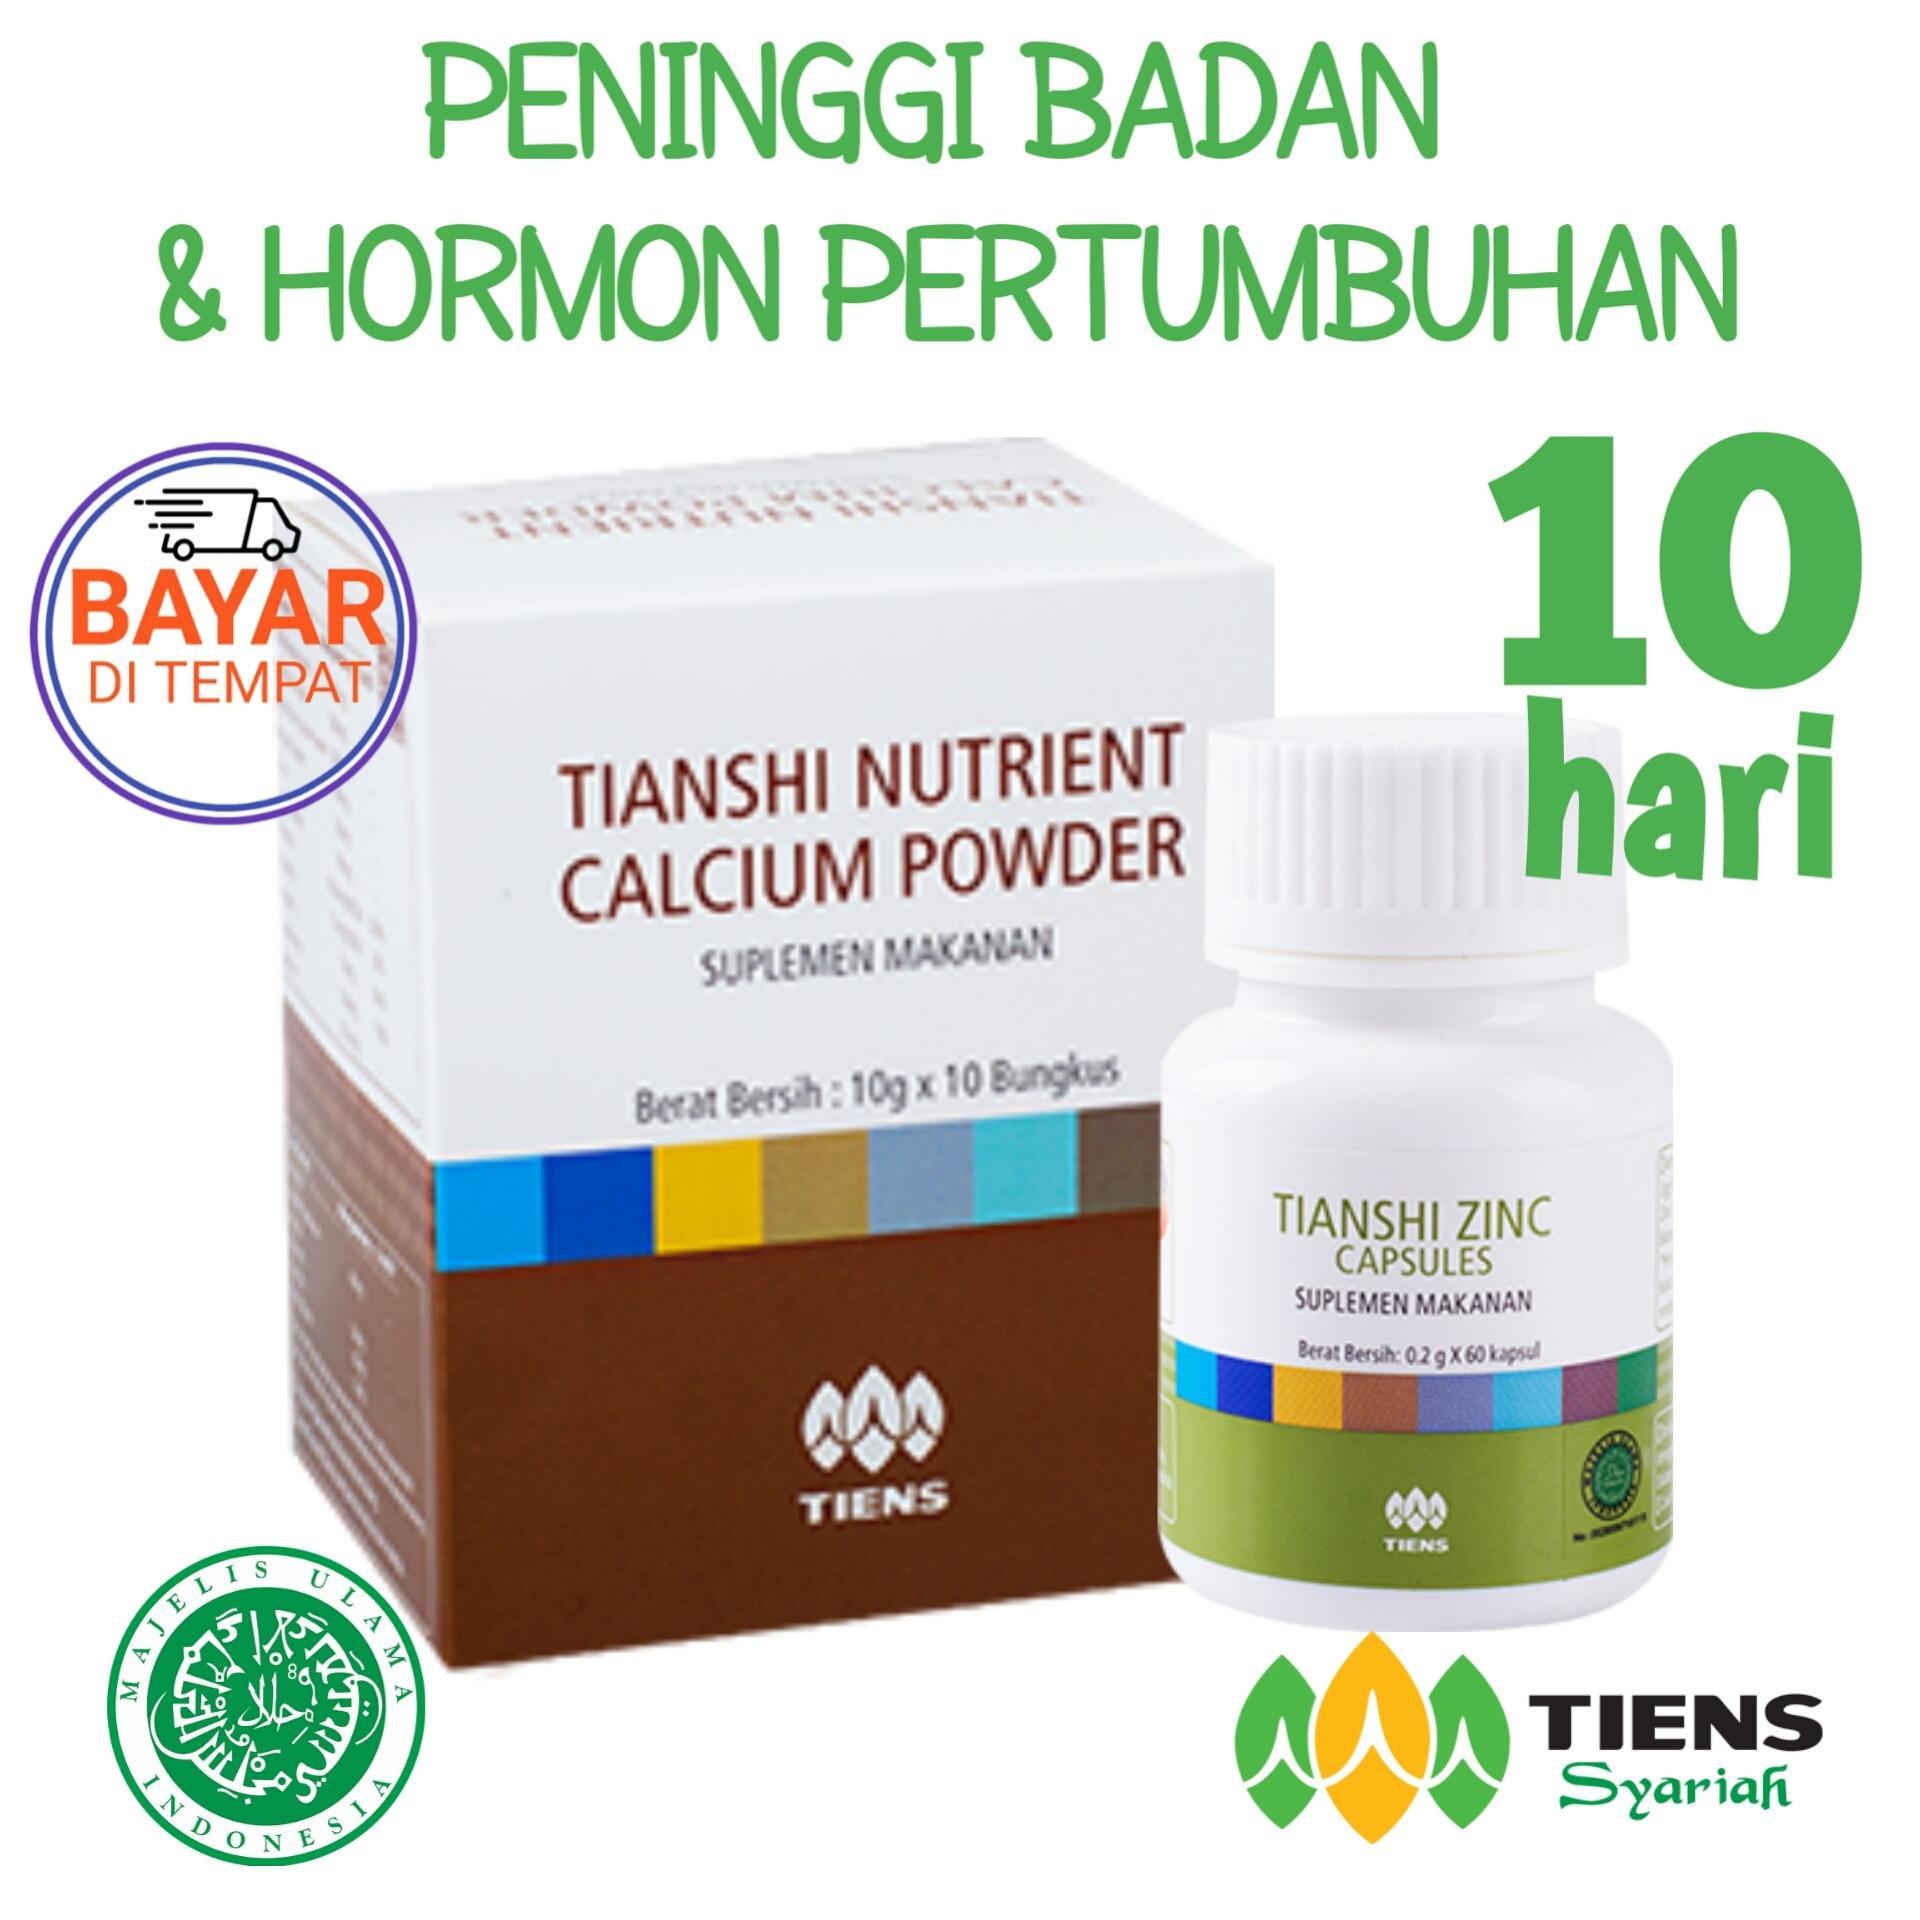 Harga Tiens Peninggi Badan Paket 1 Box Calsium 1 Botol Zinc Promo Banting Harga Free Member Voucher New